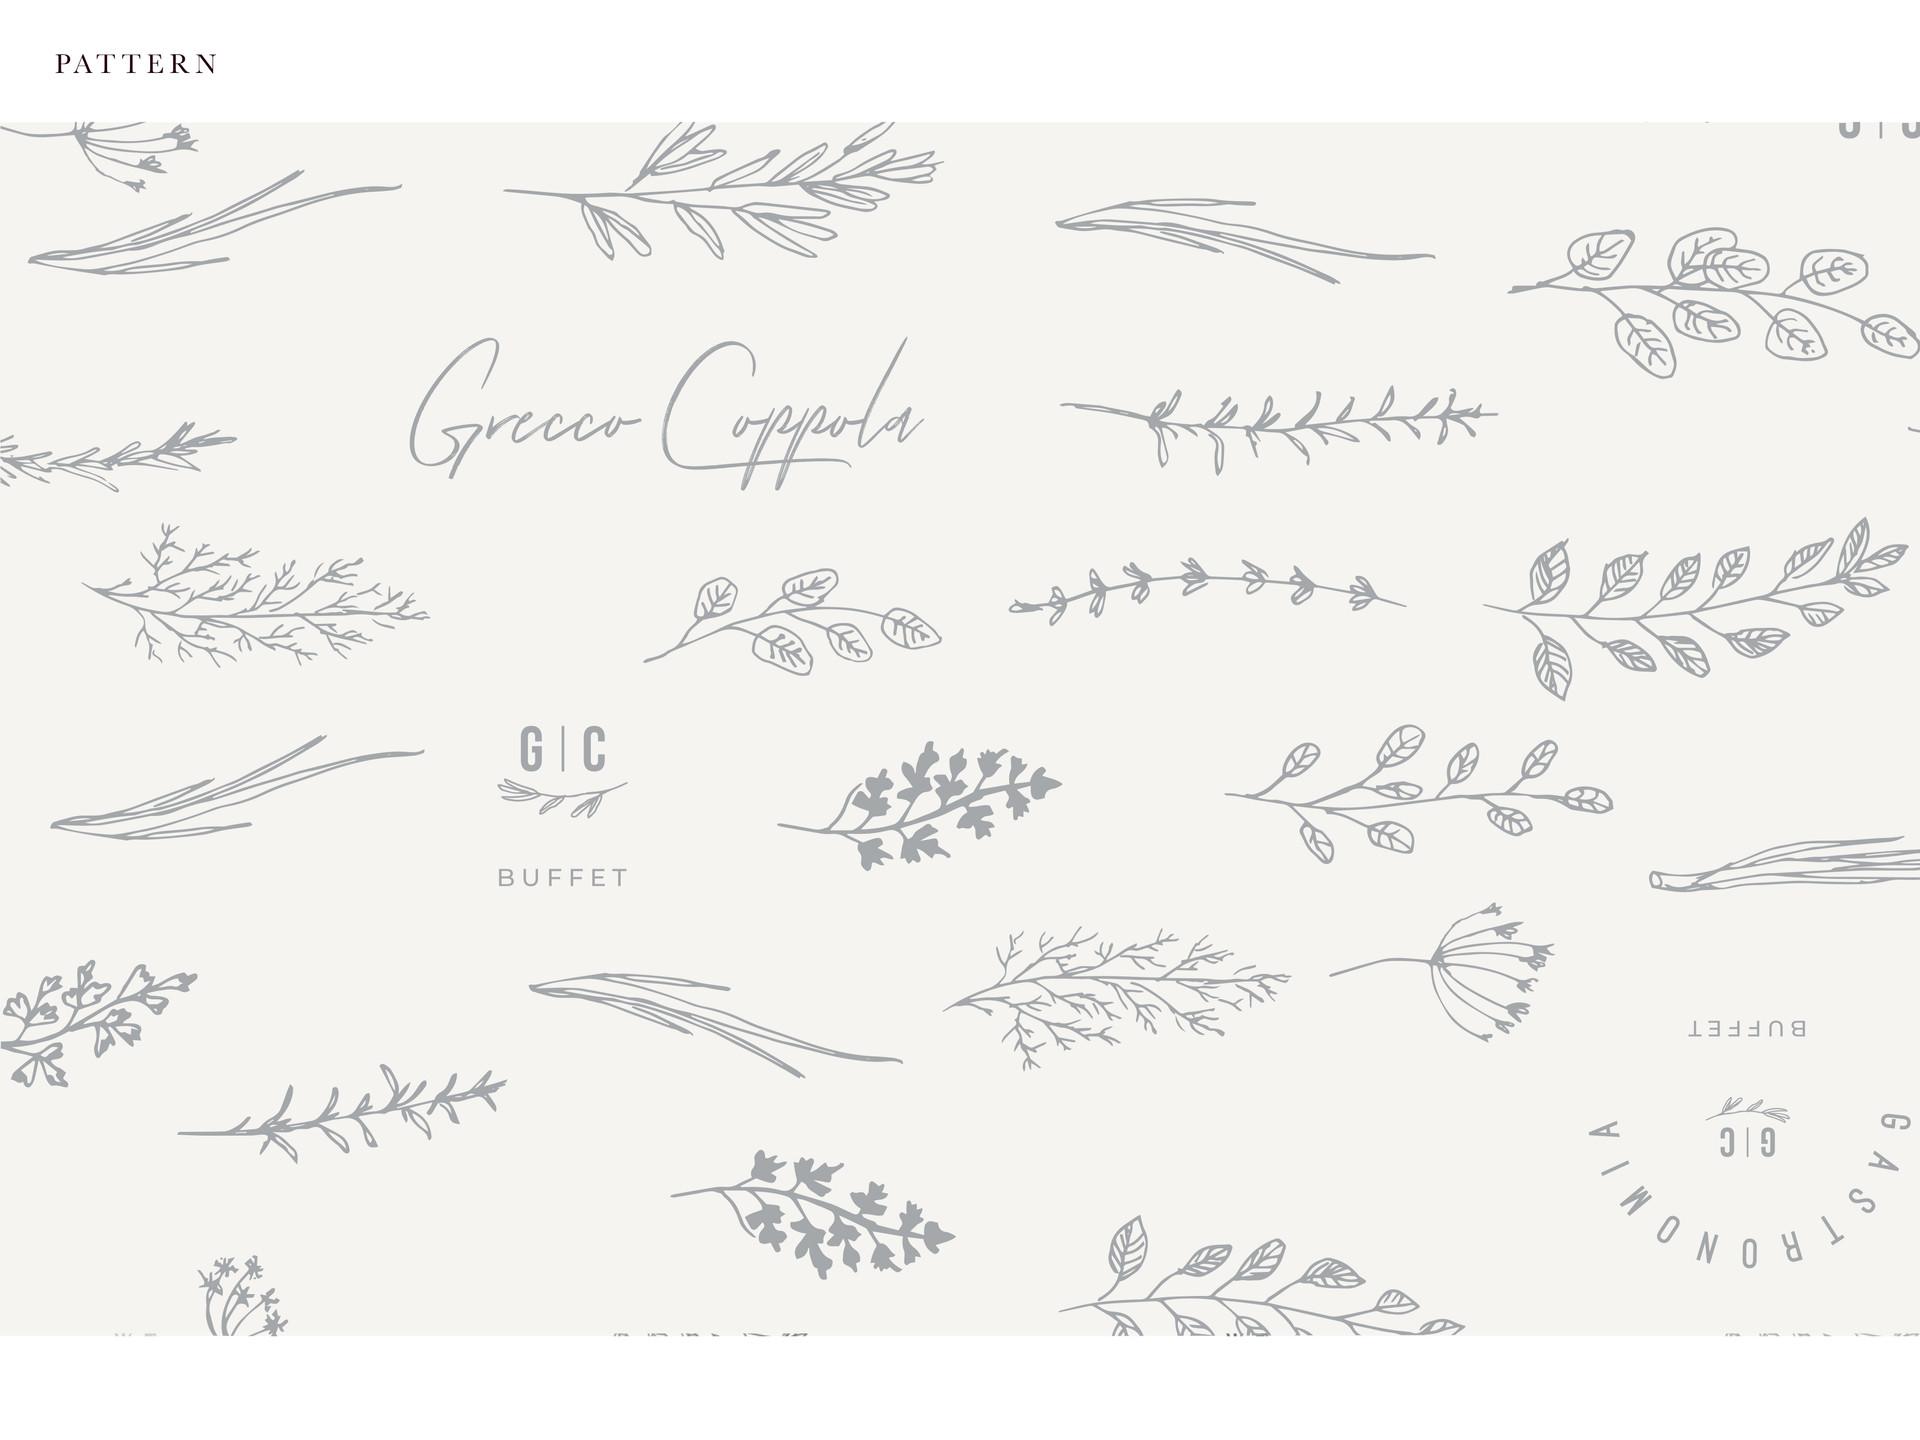 Pattern_GreccoCoppola.jpg